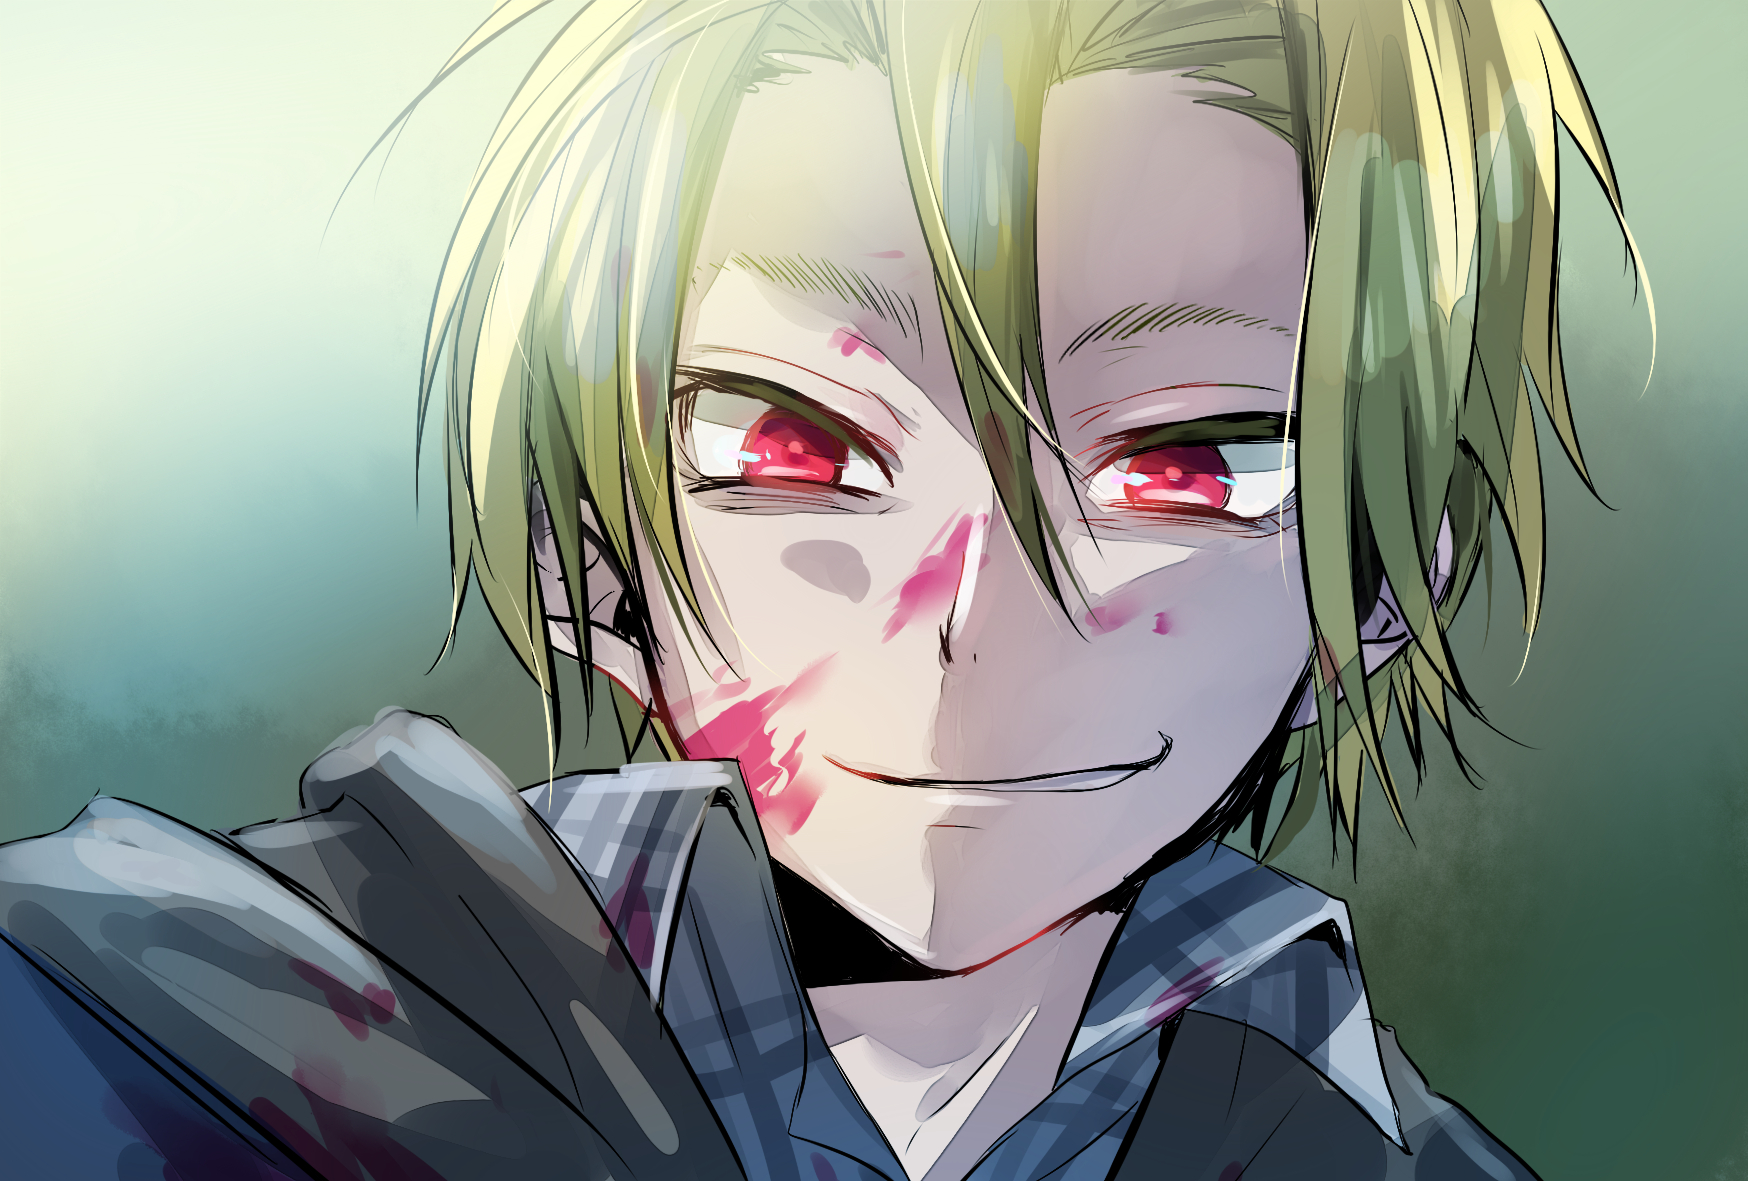 Image Result For Anime Boy Wallpaper Download